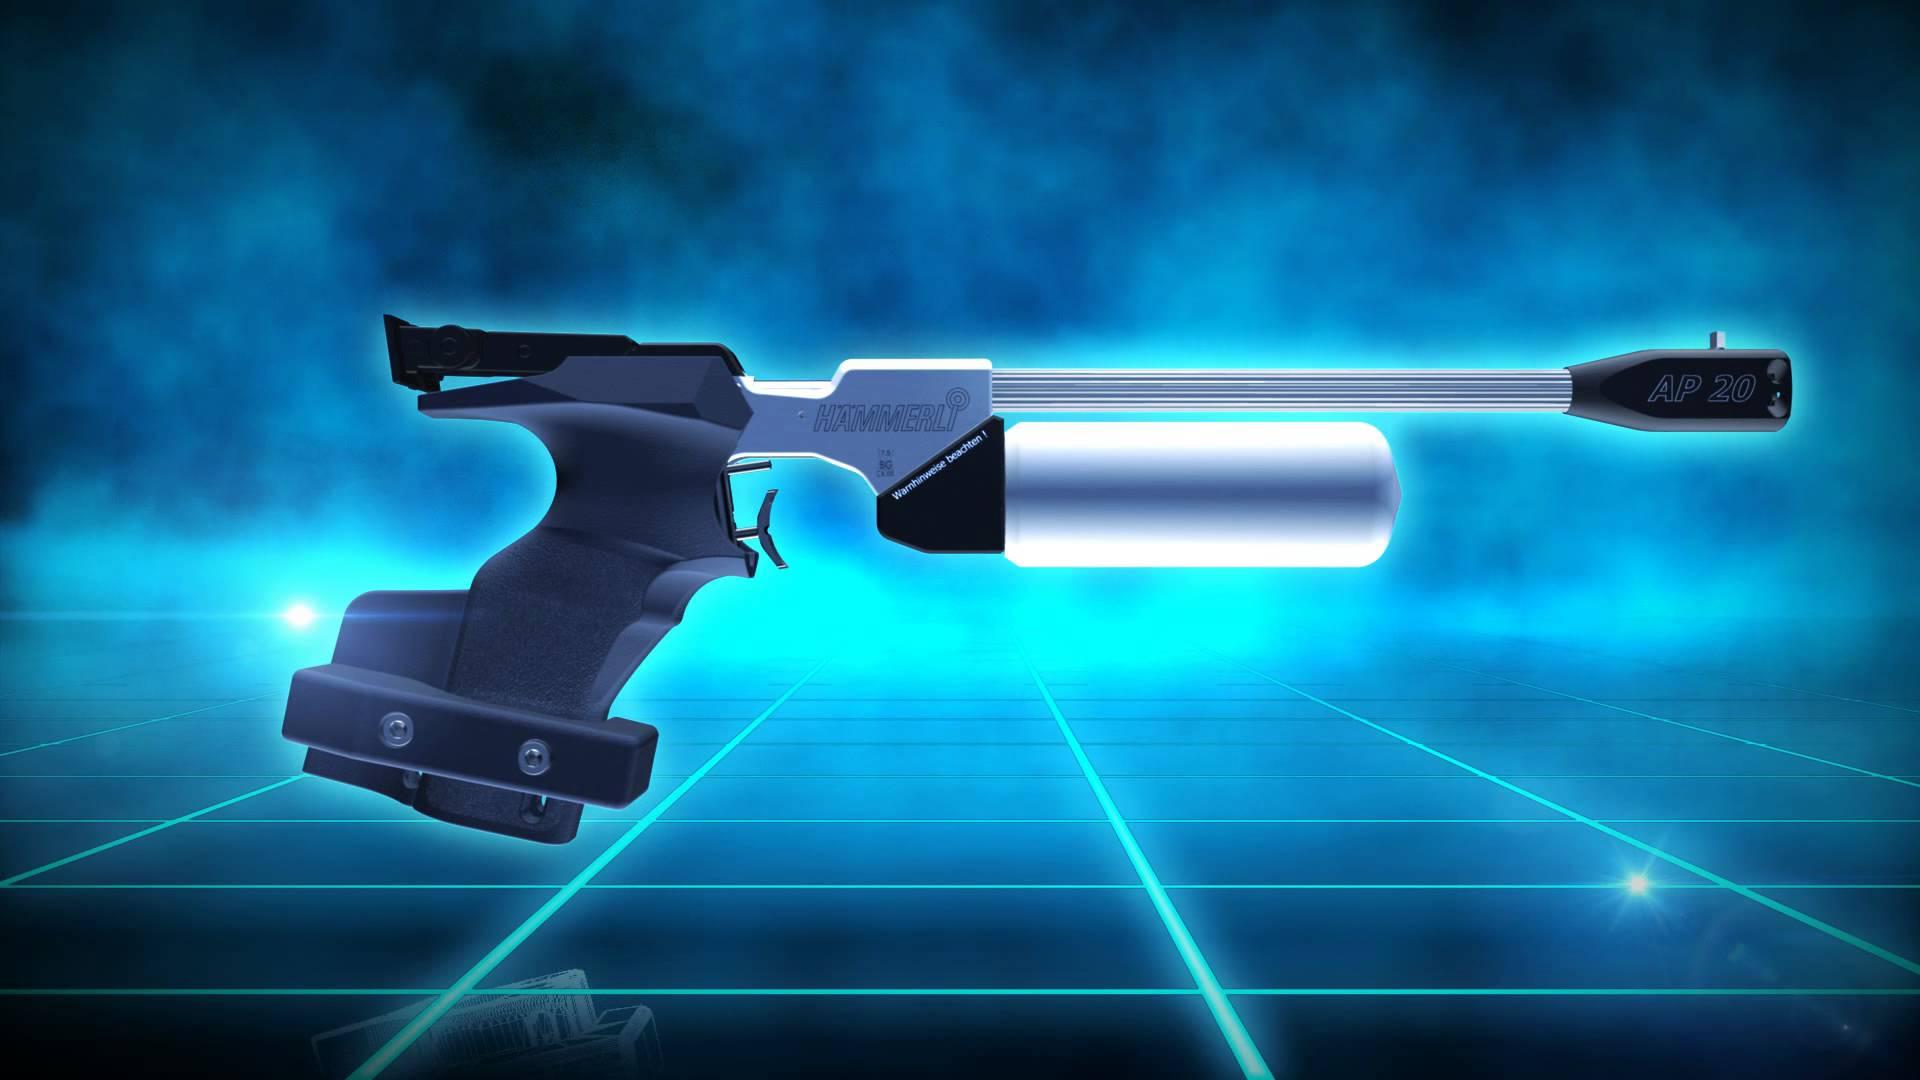 Pistolet Hammerli ap 20